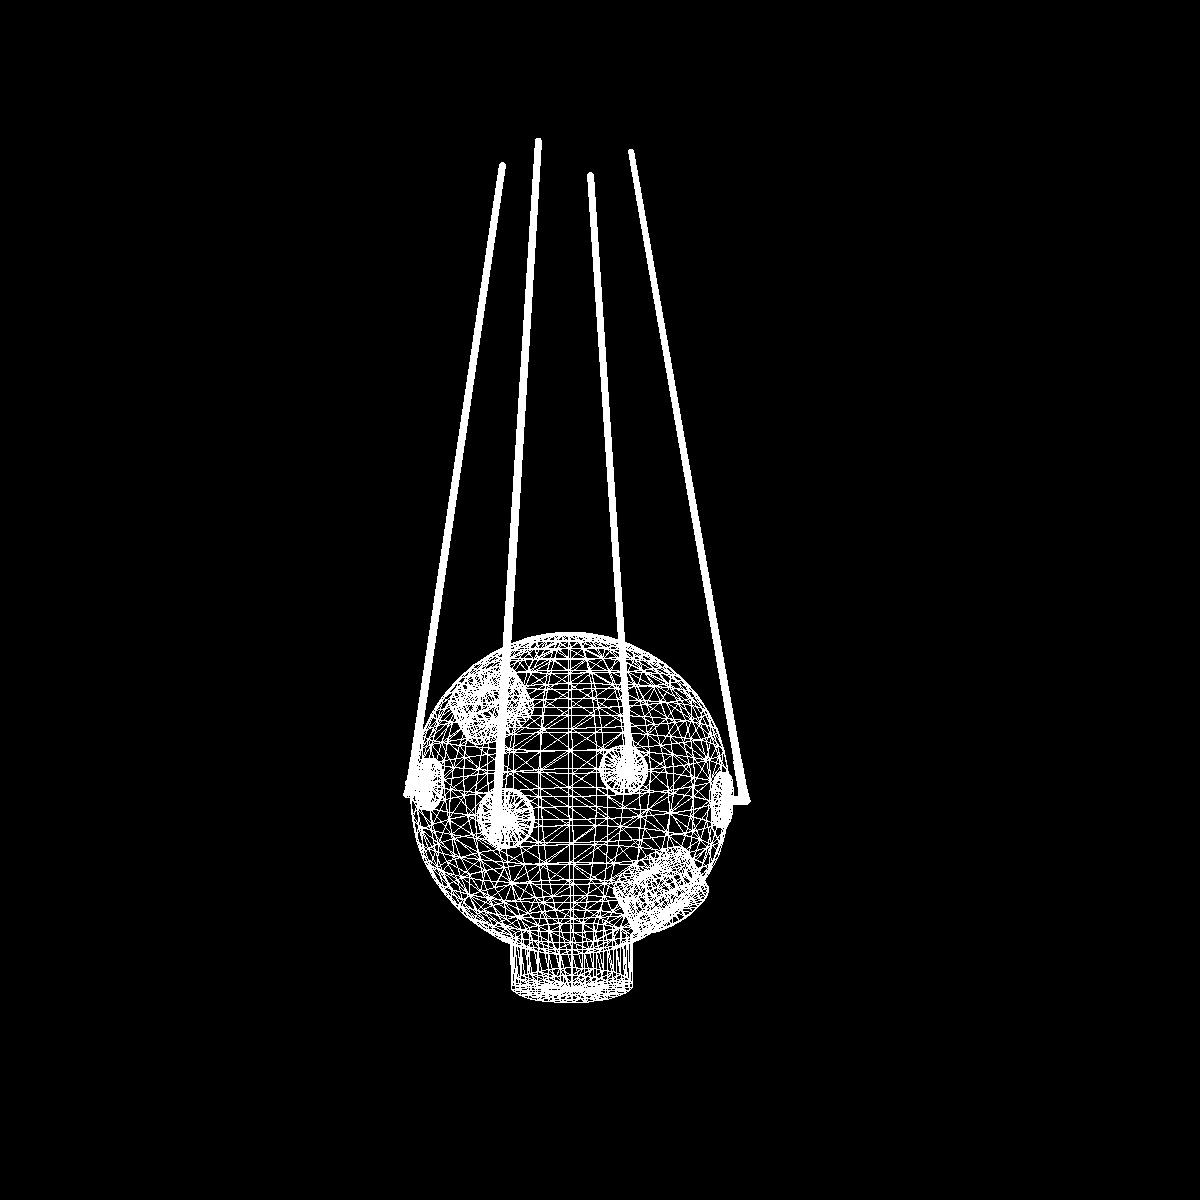 avangard ii satelit 3d model 3ds dxf fbx mješavina cob dae x obj 163952